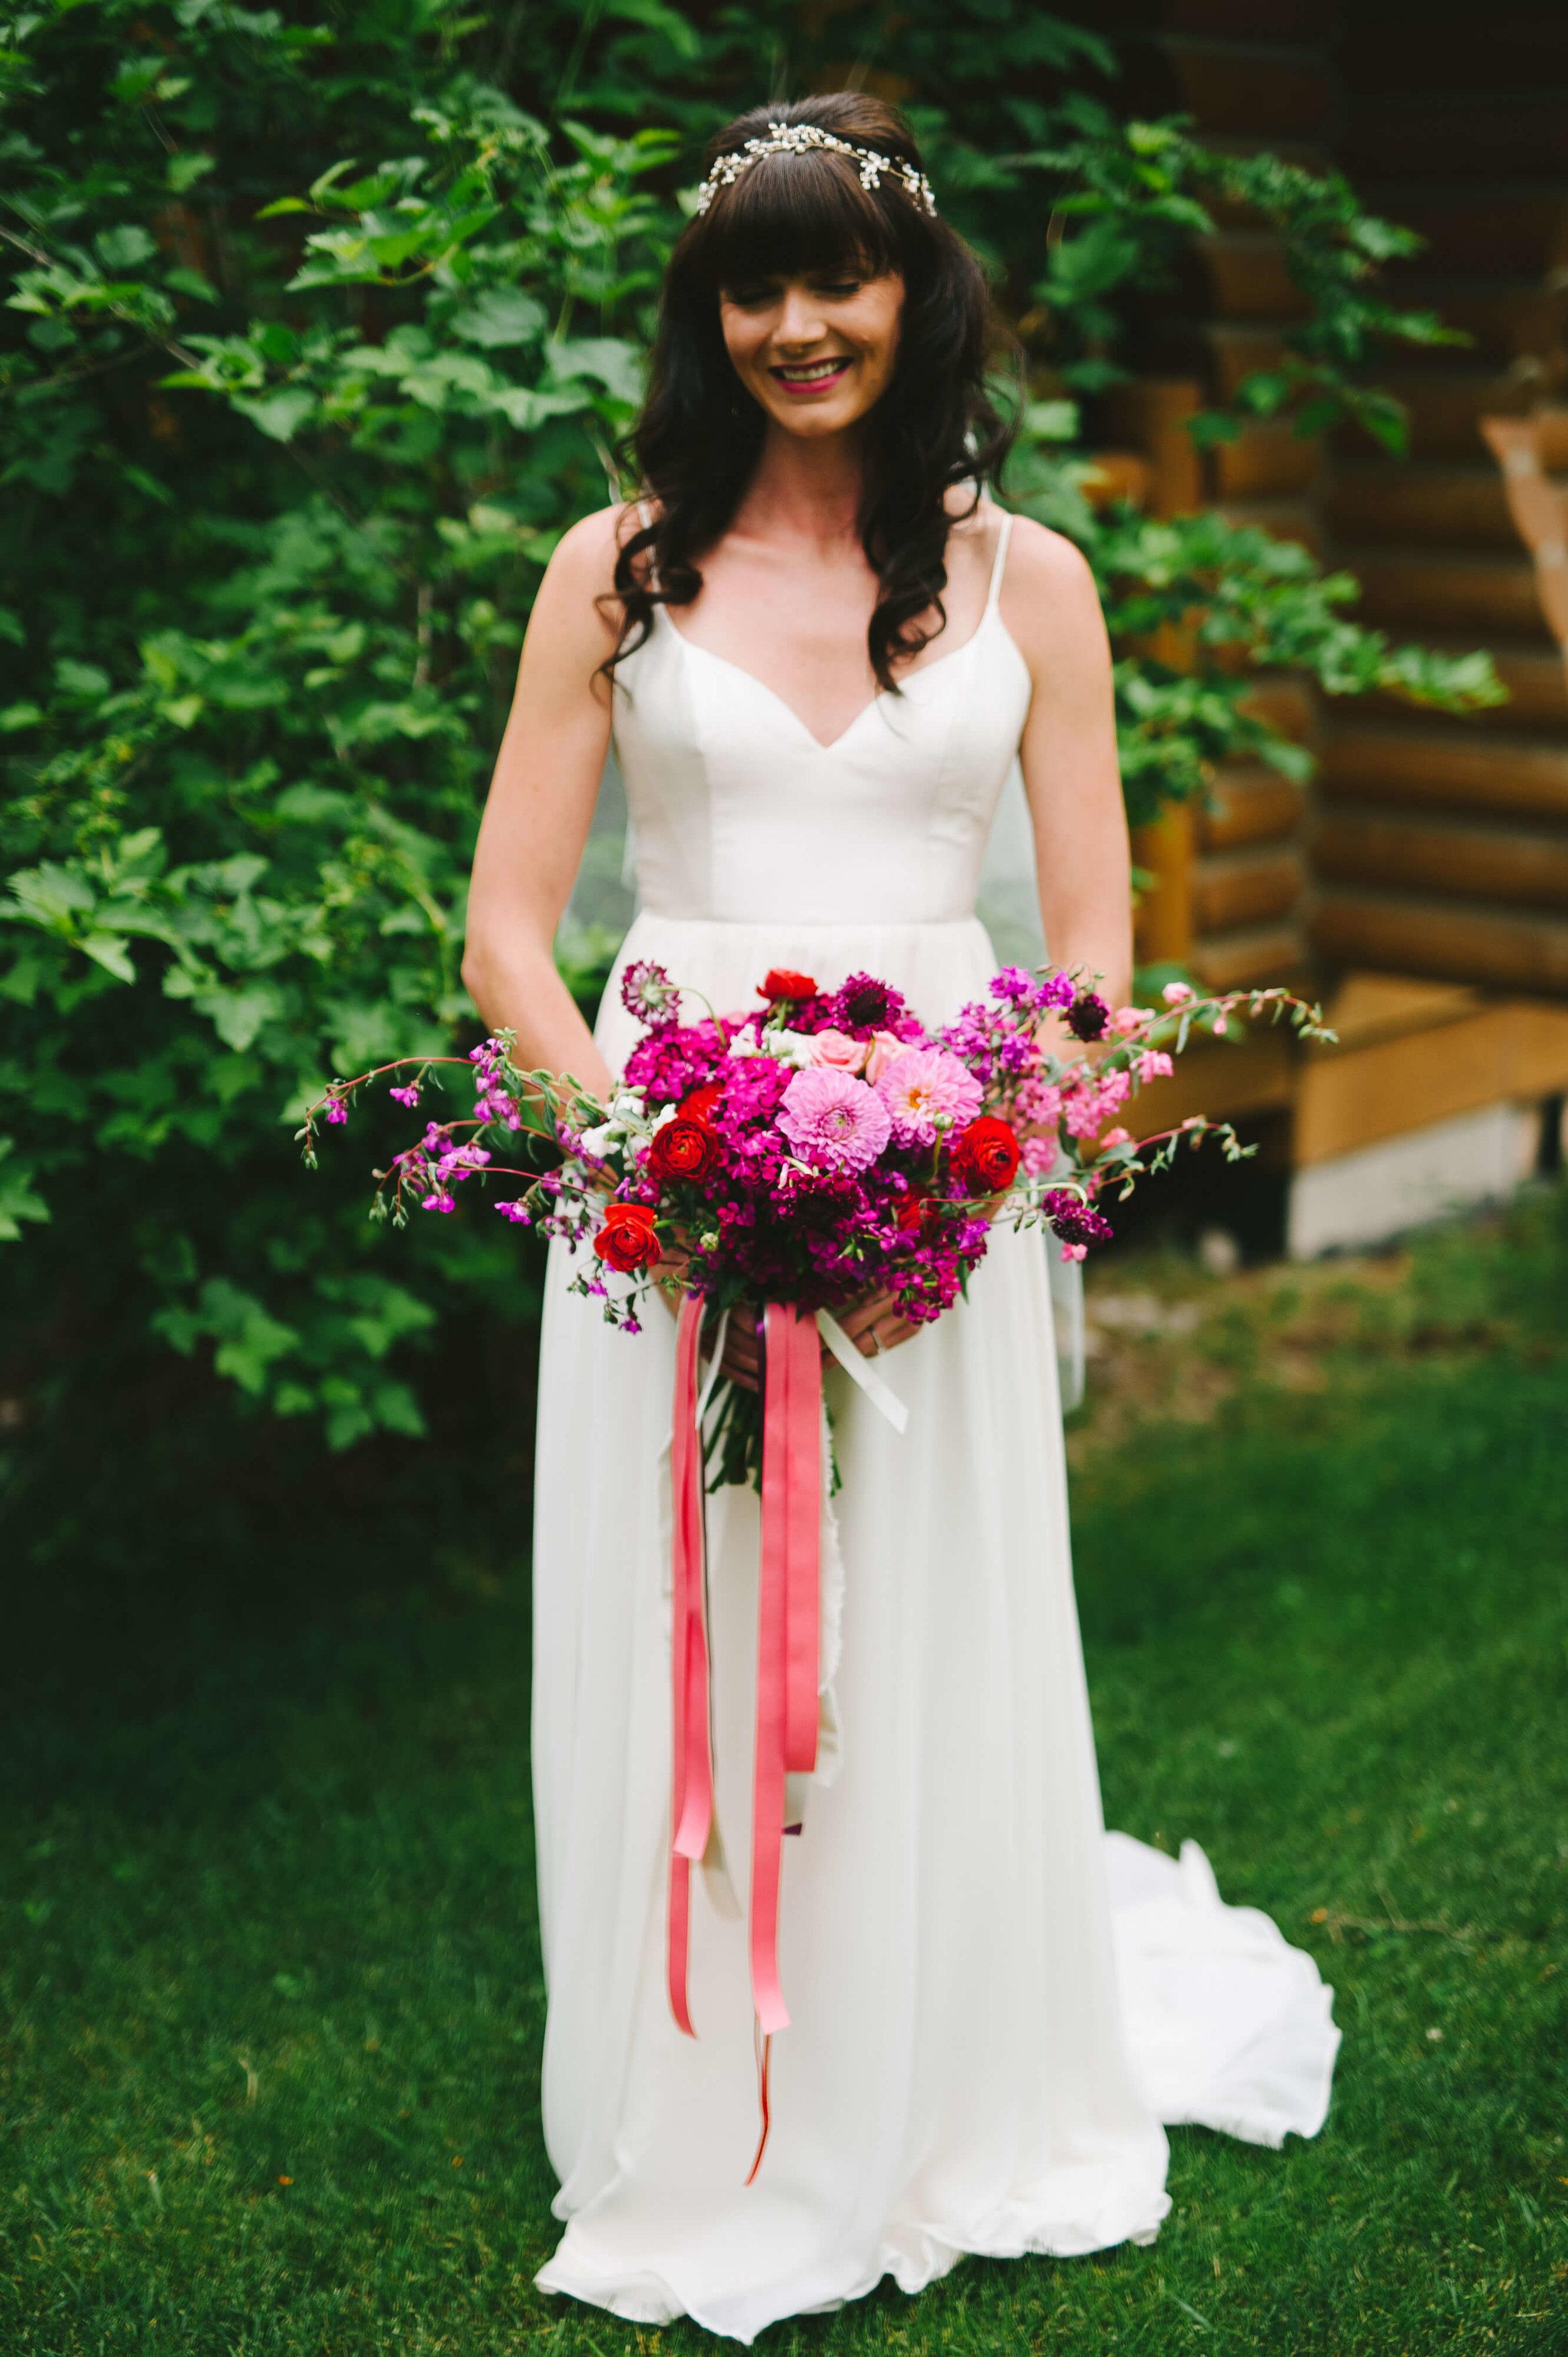 engle-olson-fran-ze-photo-montana-wedding-17.jpg